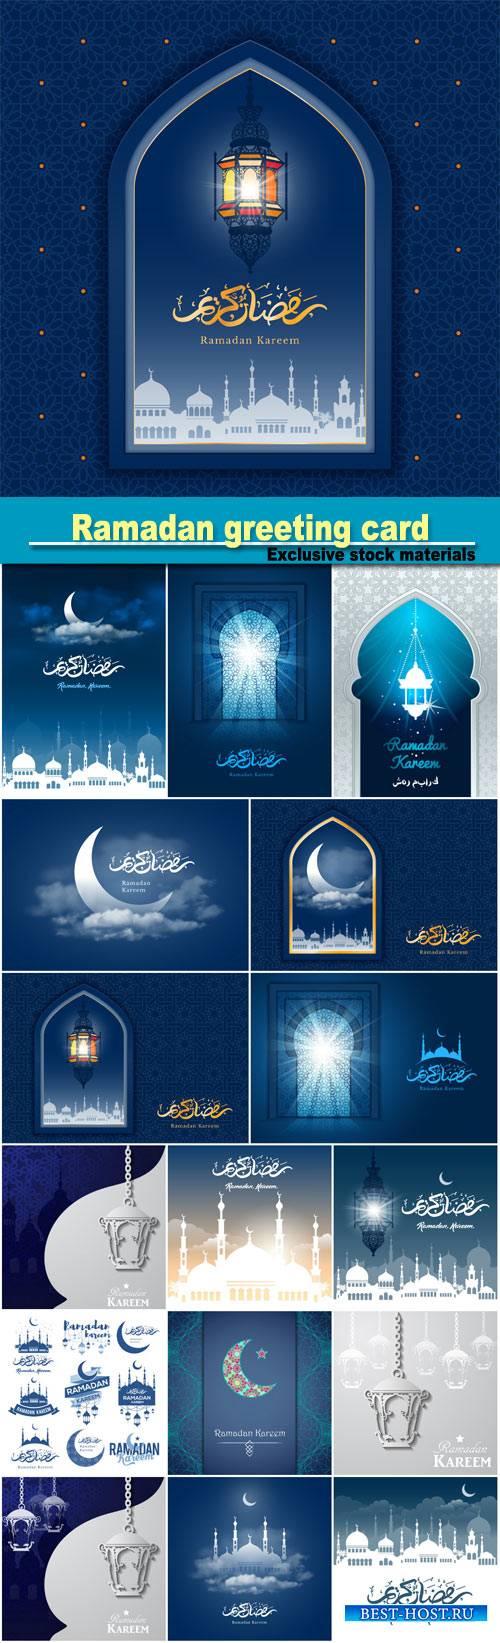 Ramadan greeting card, vector background